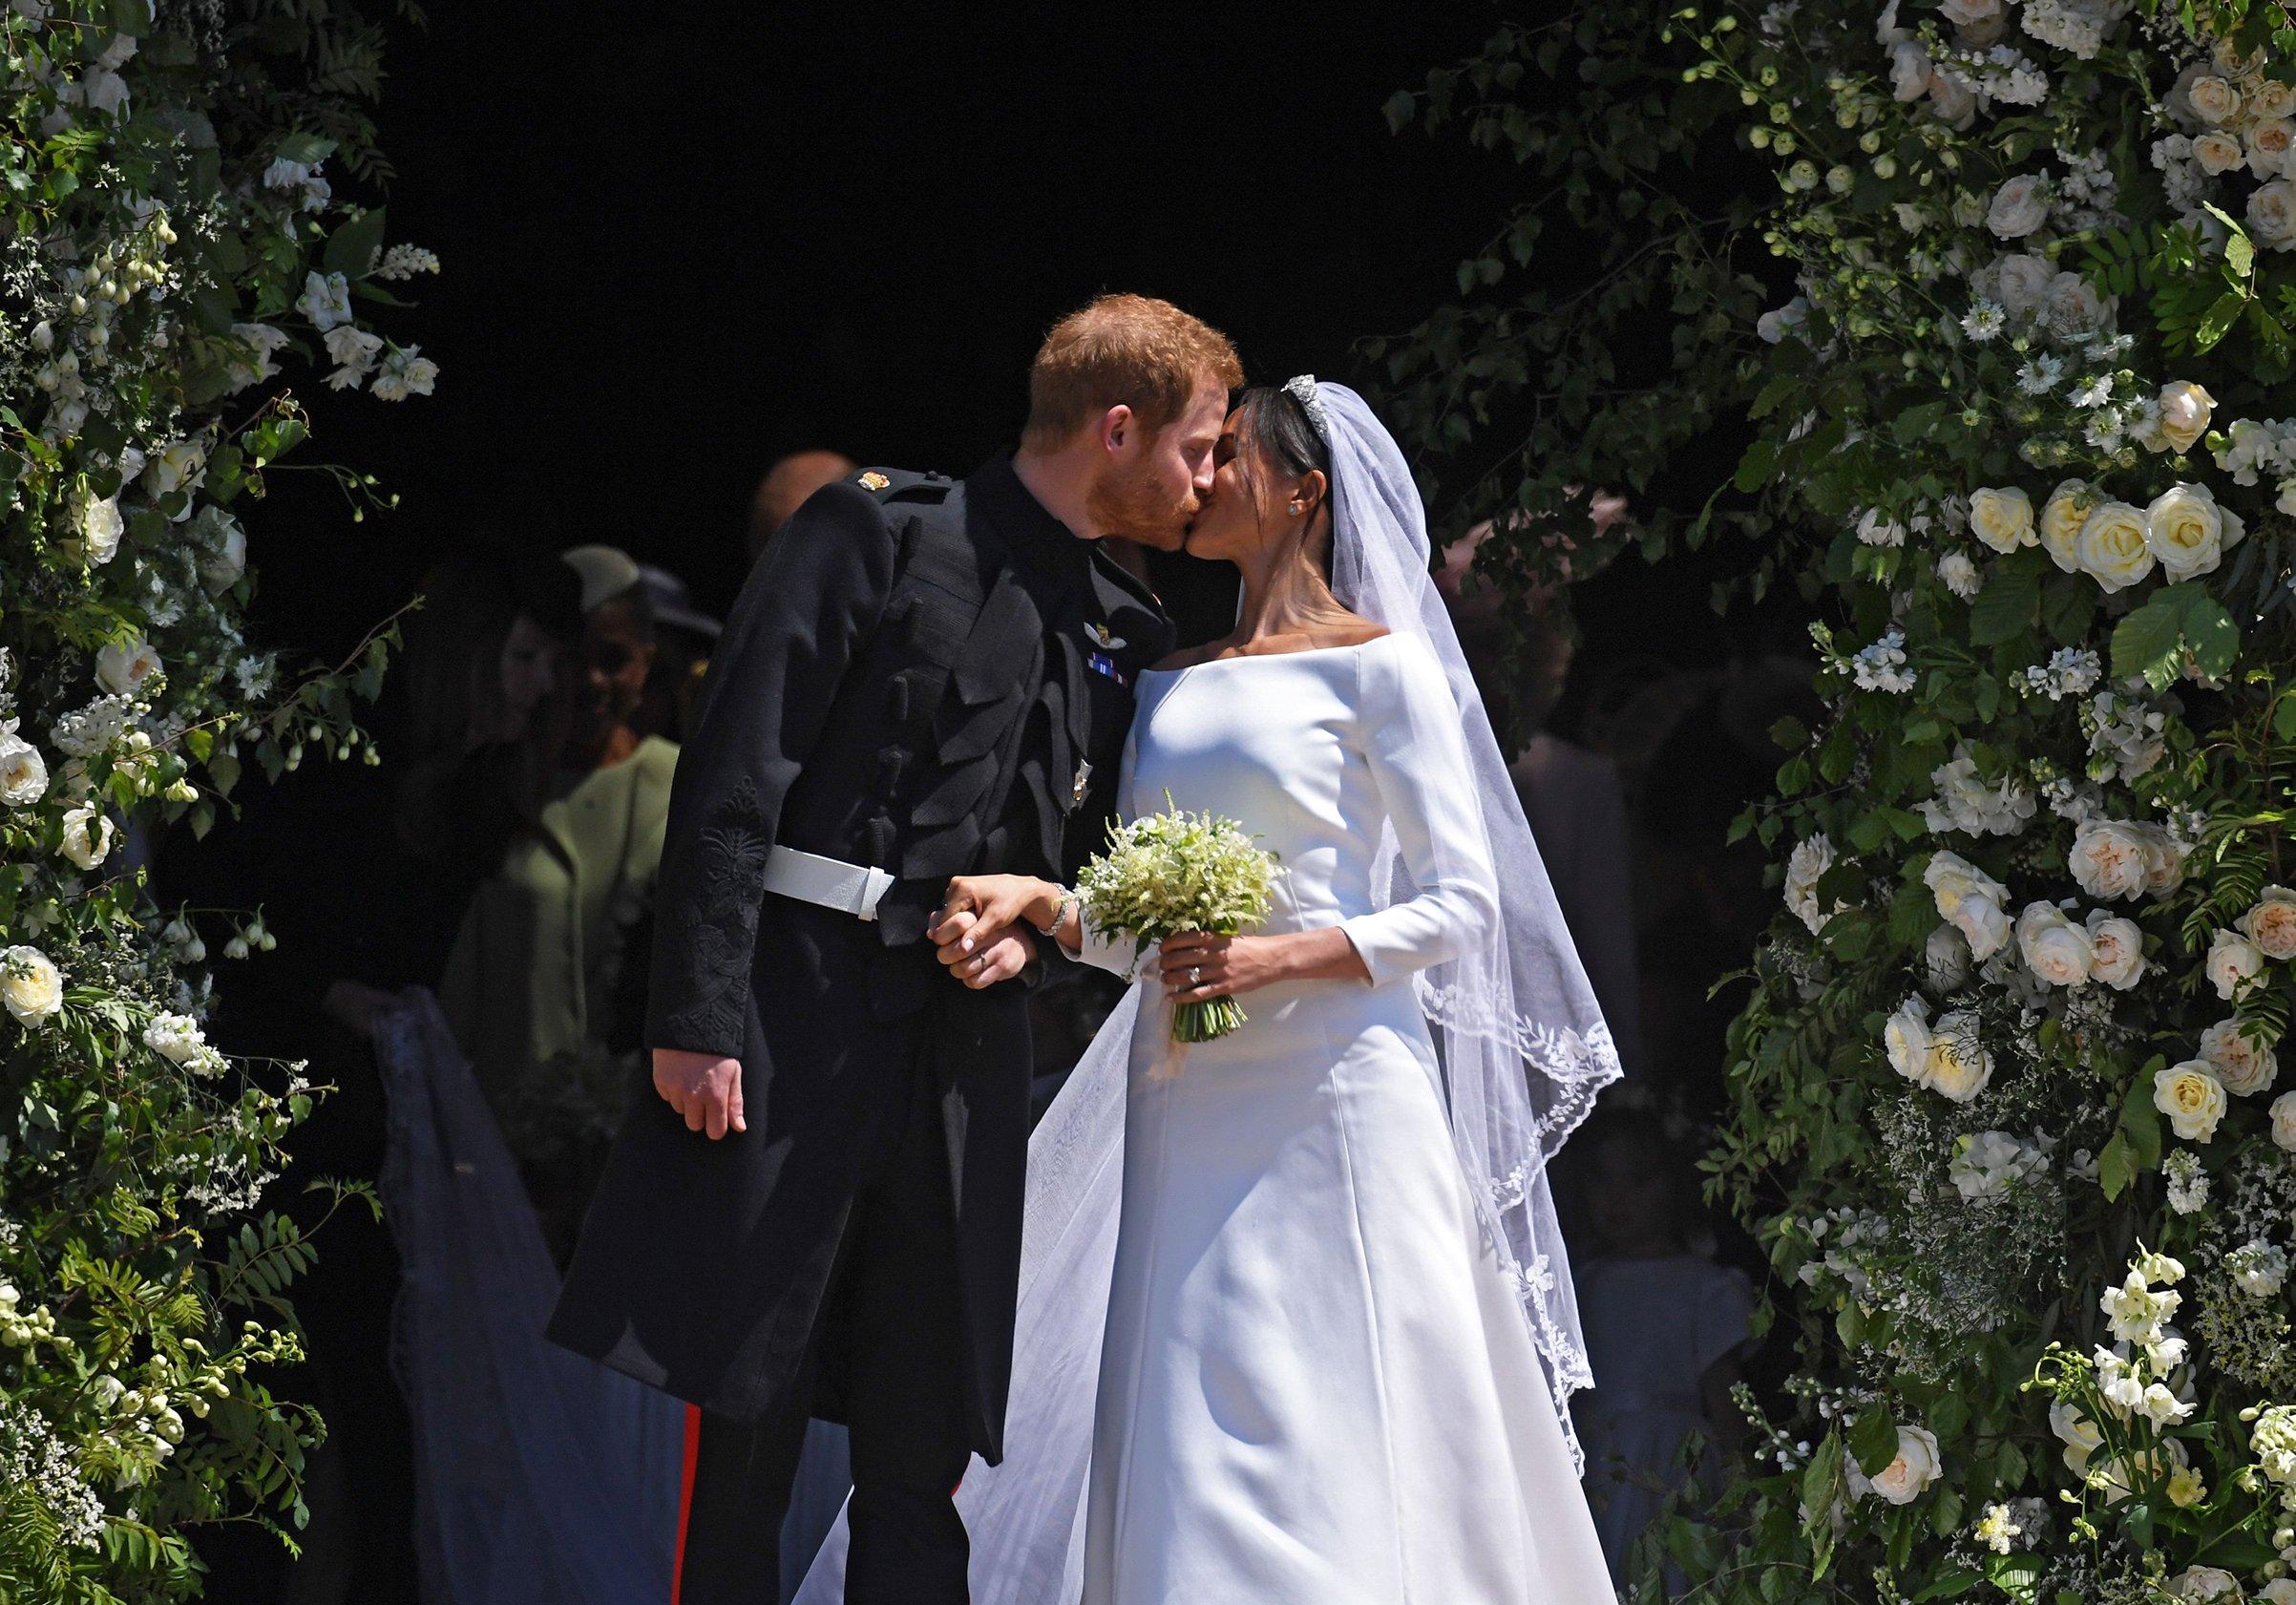 royal-wedding-2018-meghan-markle-prince-harry-church-kiss.jpg